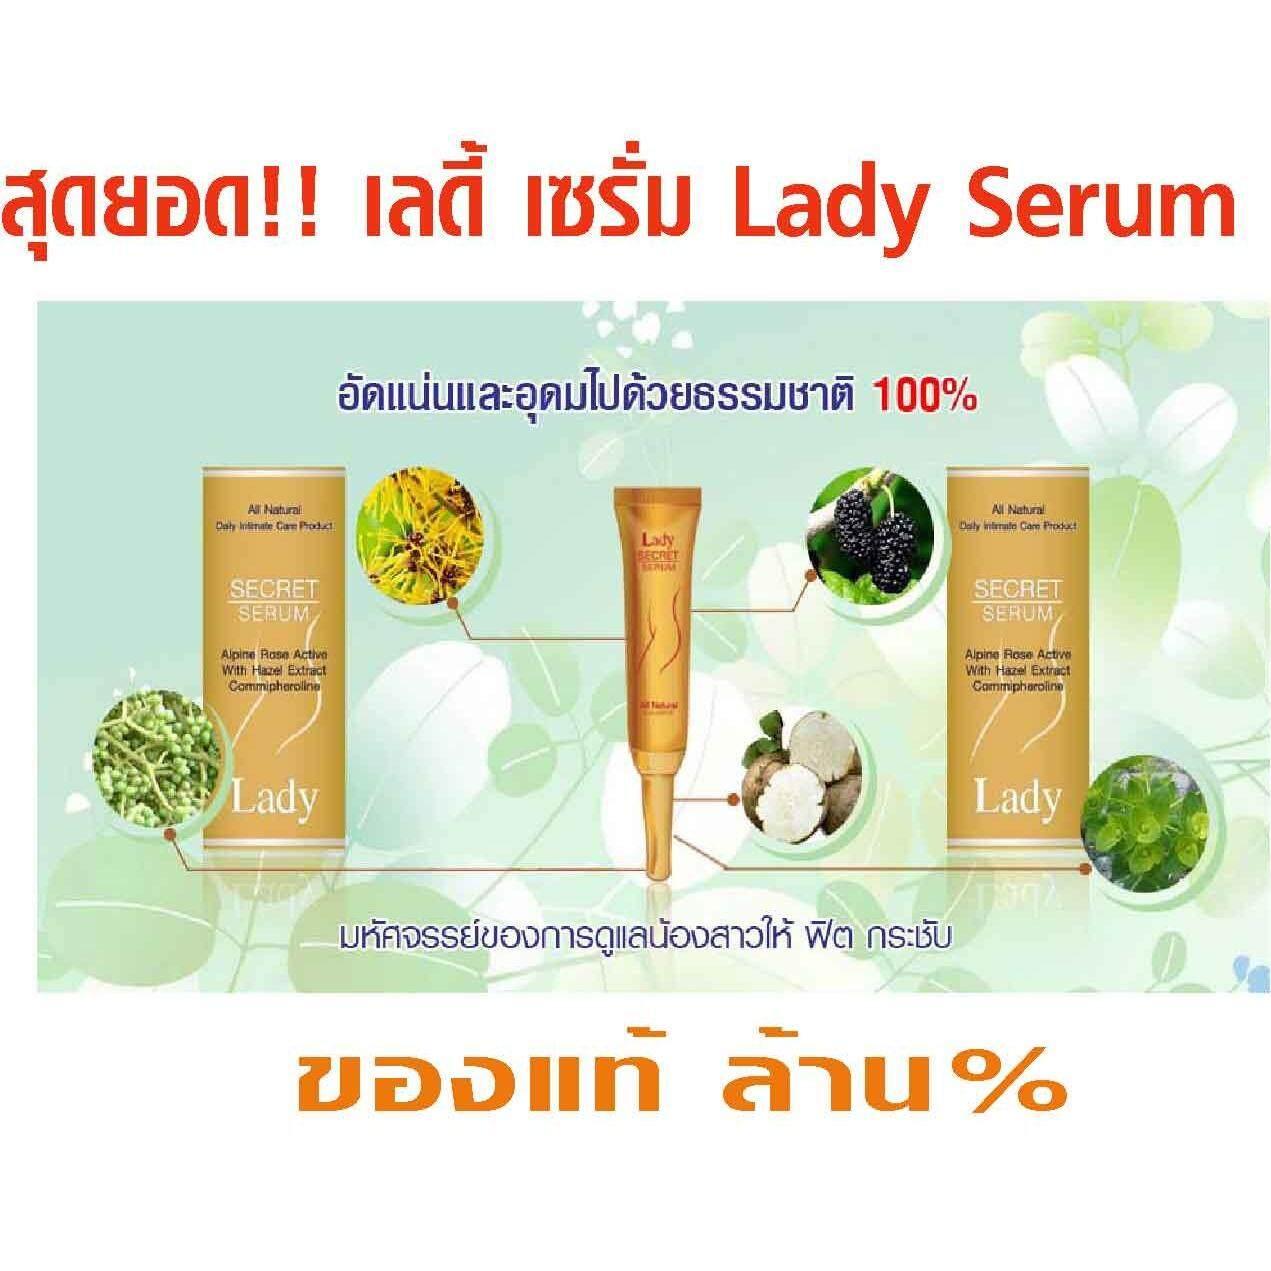 Lady Serum แก้ปัญหาจุดซ่อนเร้น อย่างได้ผลภายใน 2 สัปดาห์ แพค 2 กล่อง ใน กรุงเทพมหานคร